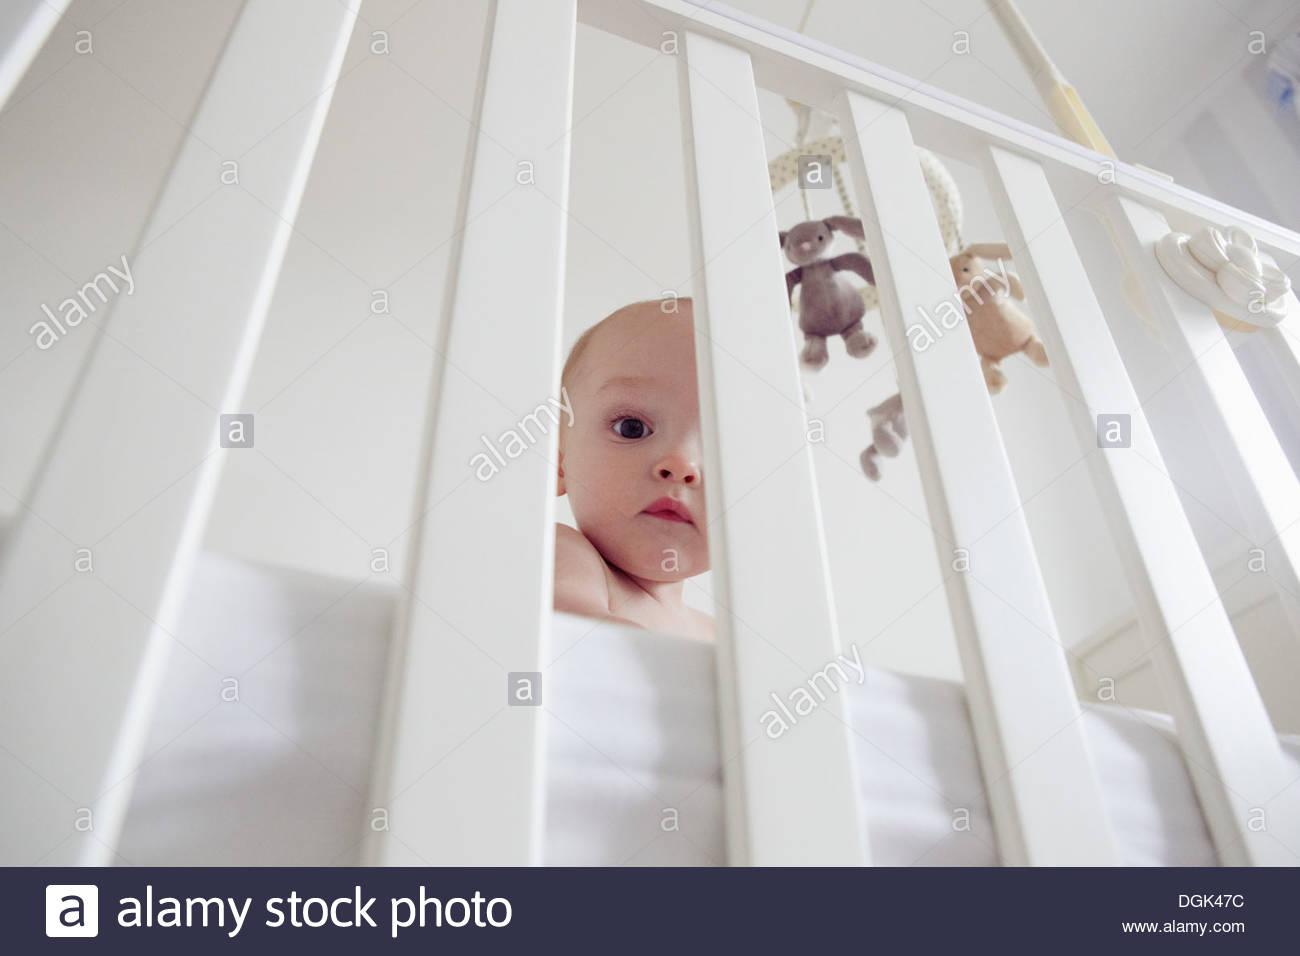 Baby boy behind bars of crib - Stock Image